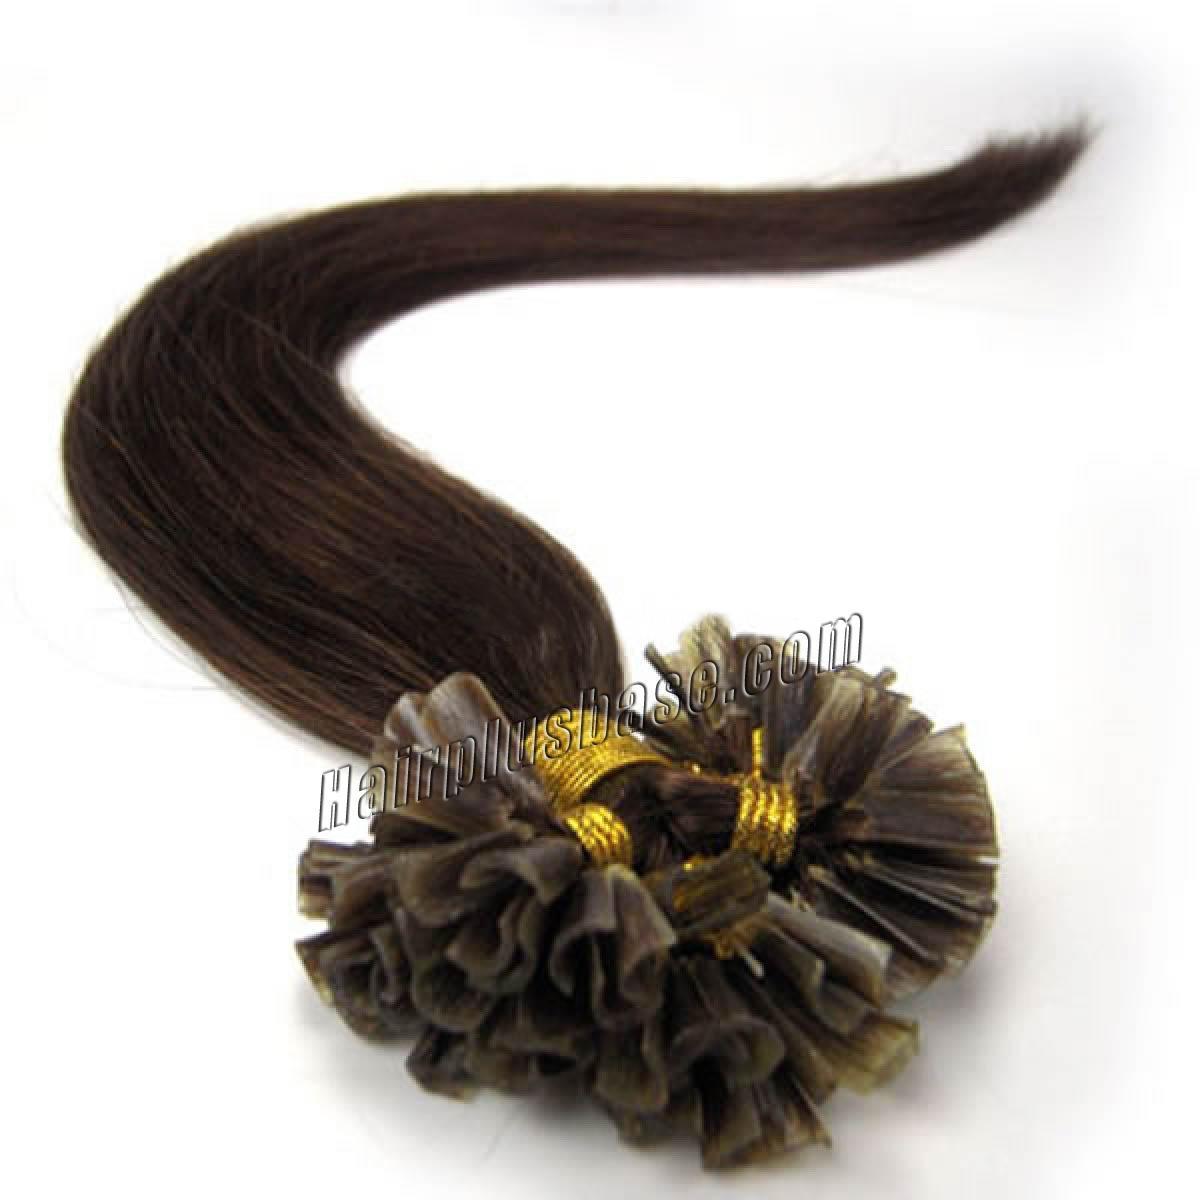 20 inch 4 medium brown stick tip human hair extensions 100s 20 inch 4 medium brown stick tip human hair extensions 100s no 1 pmusecretfo Image collections